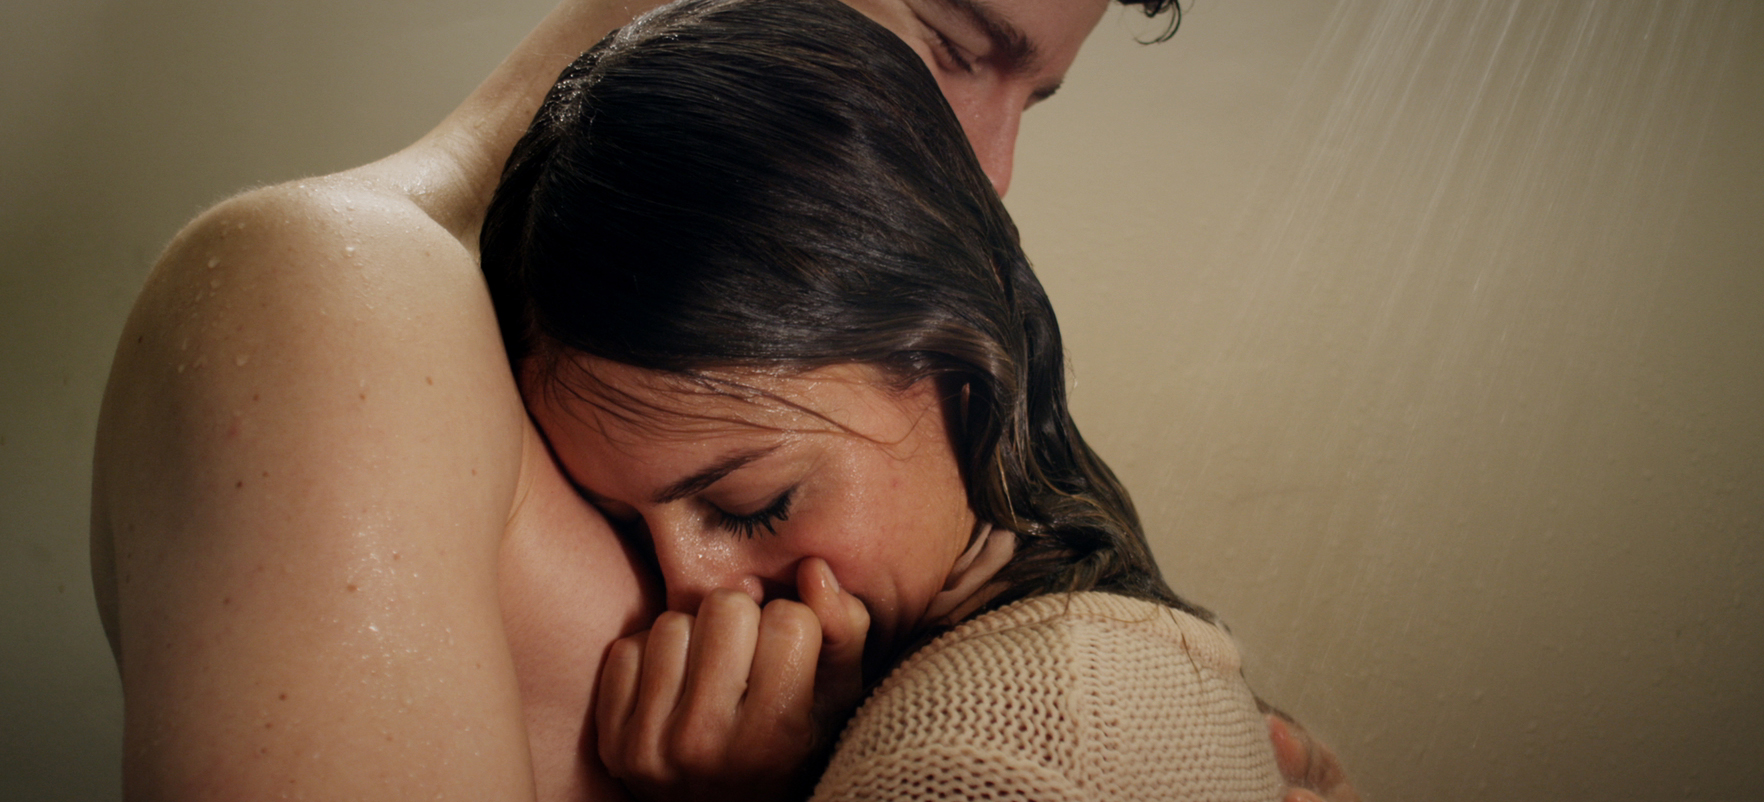 Katie & Paul - In the Shower-web.jpg